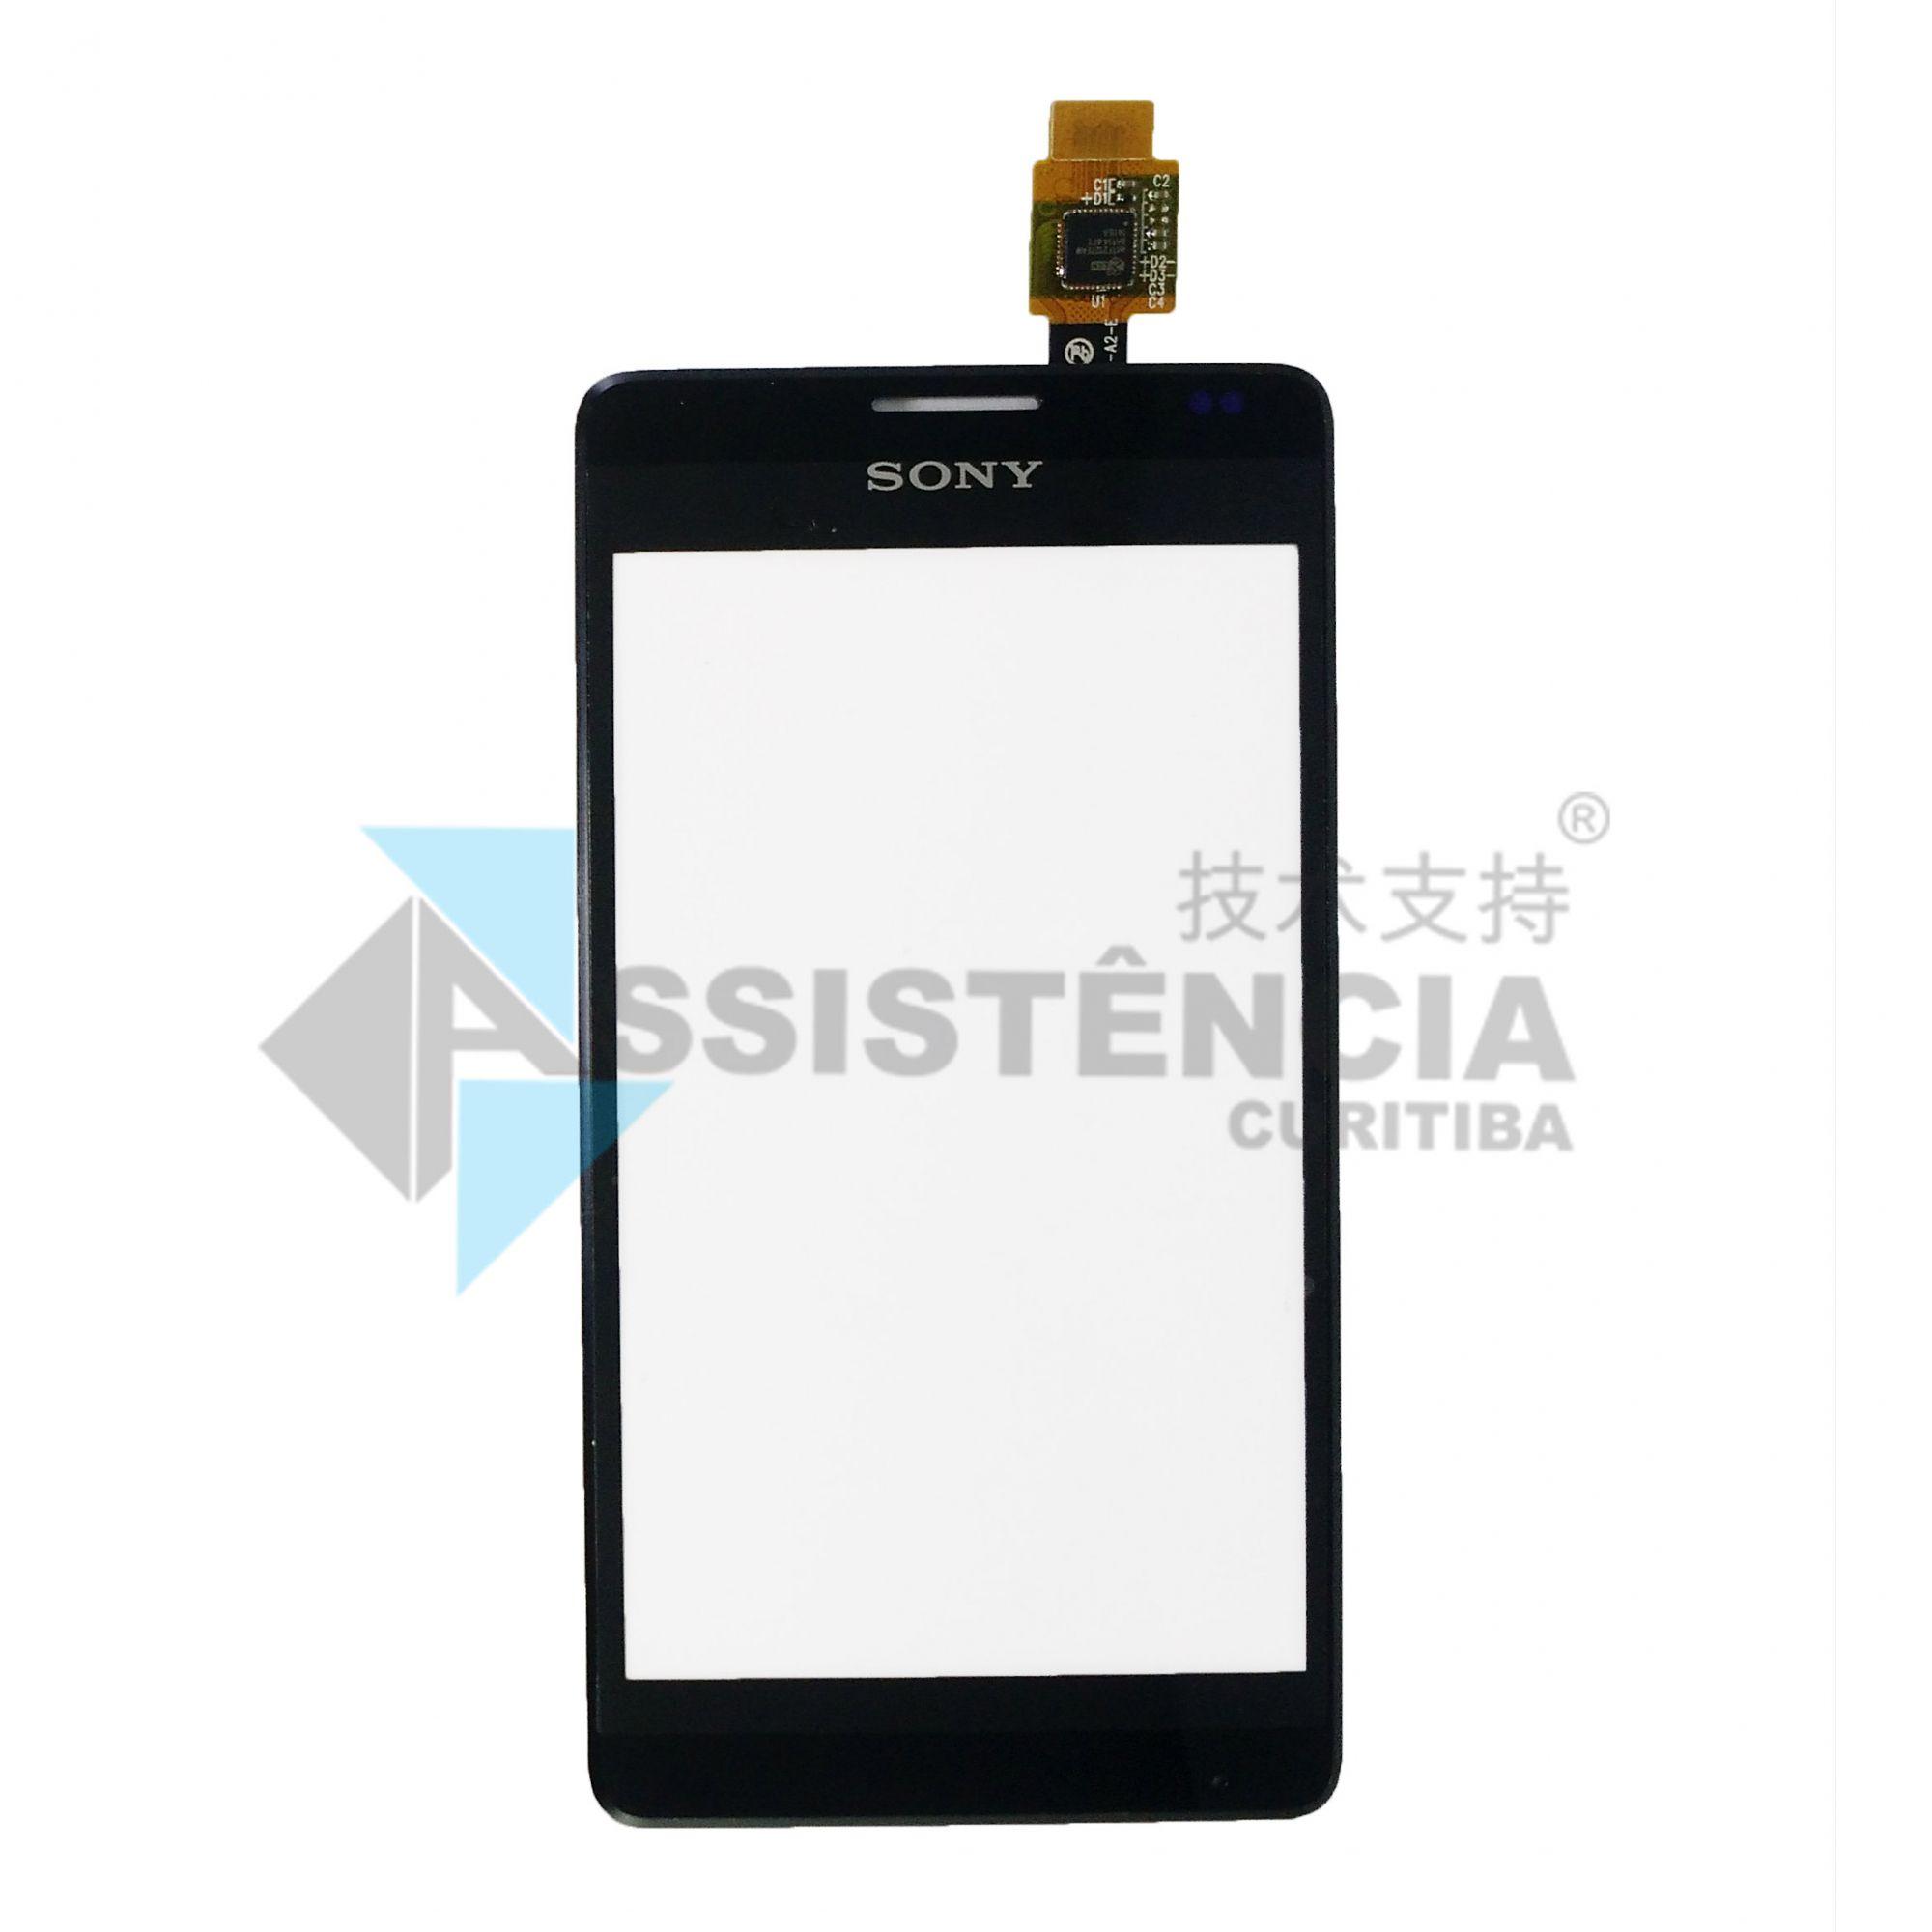 Tela Touch Sony Xperia E1 D2004 D2014 D2104 D2114 Original